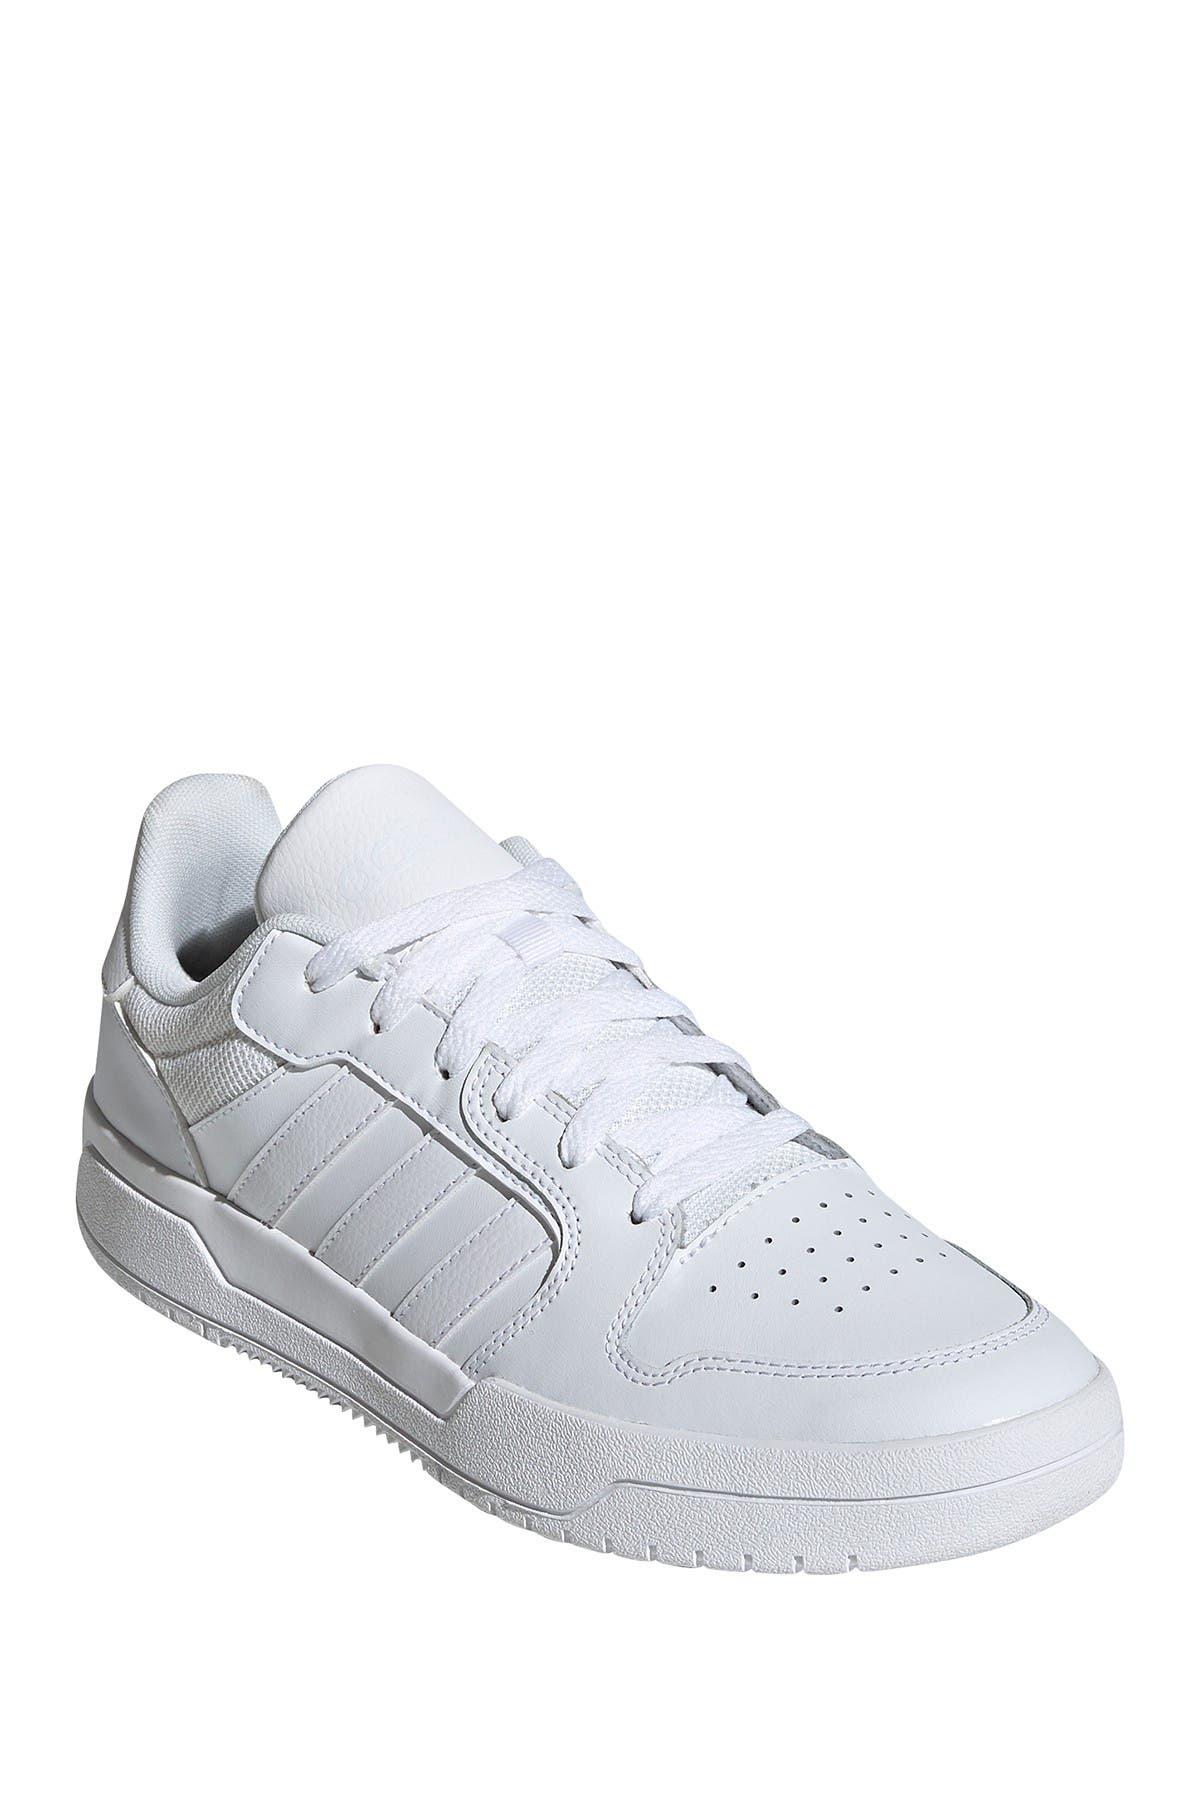 Image of adidas Entrap Sneaker